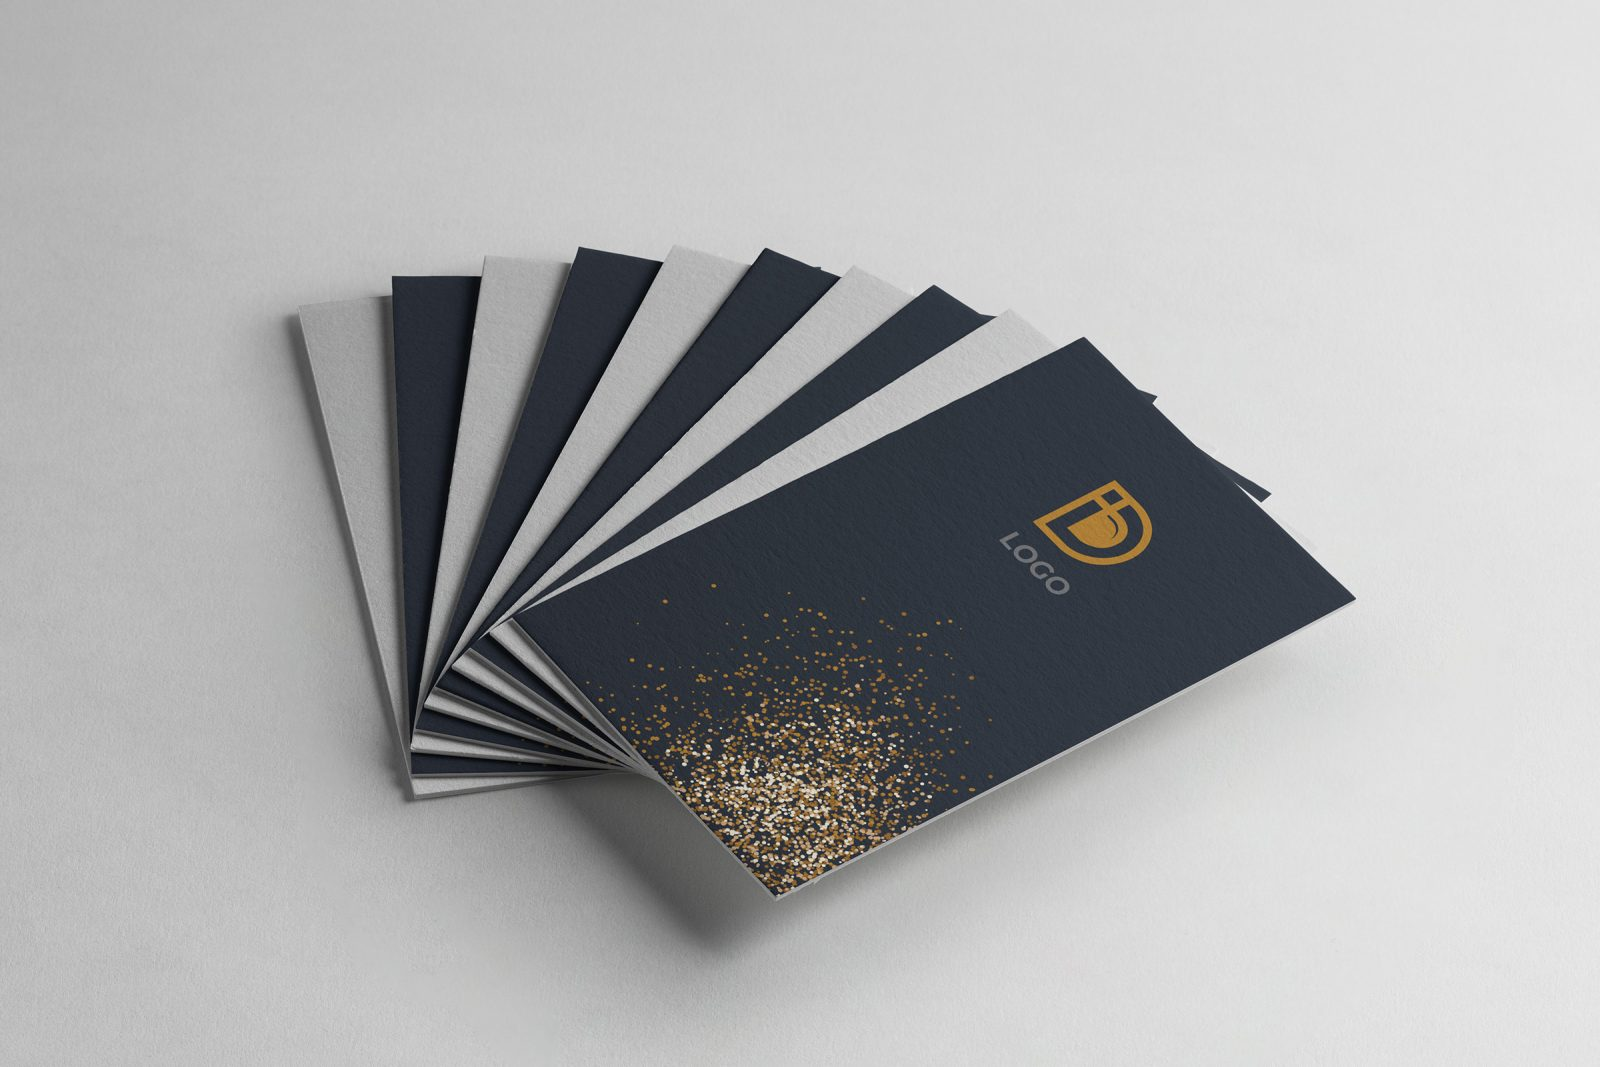 digital company vertical business card design template